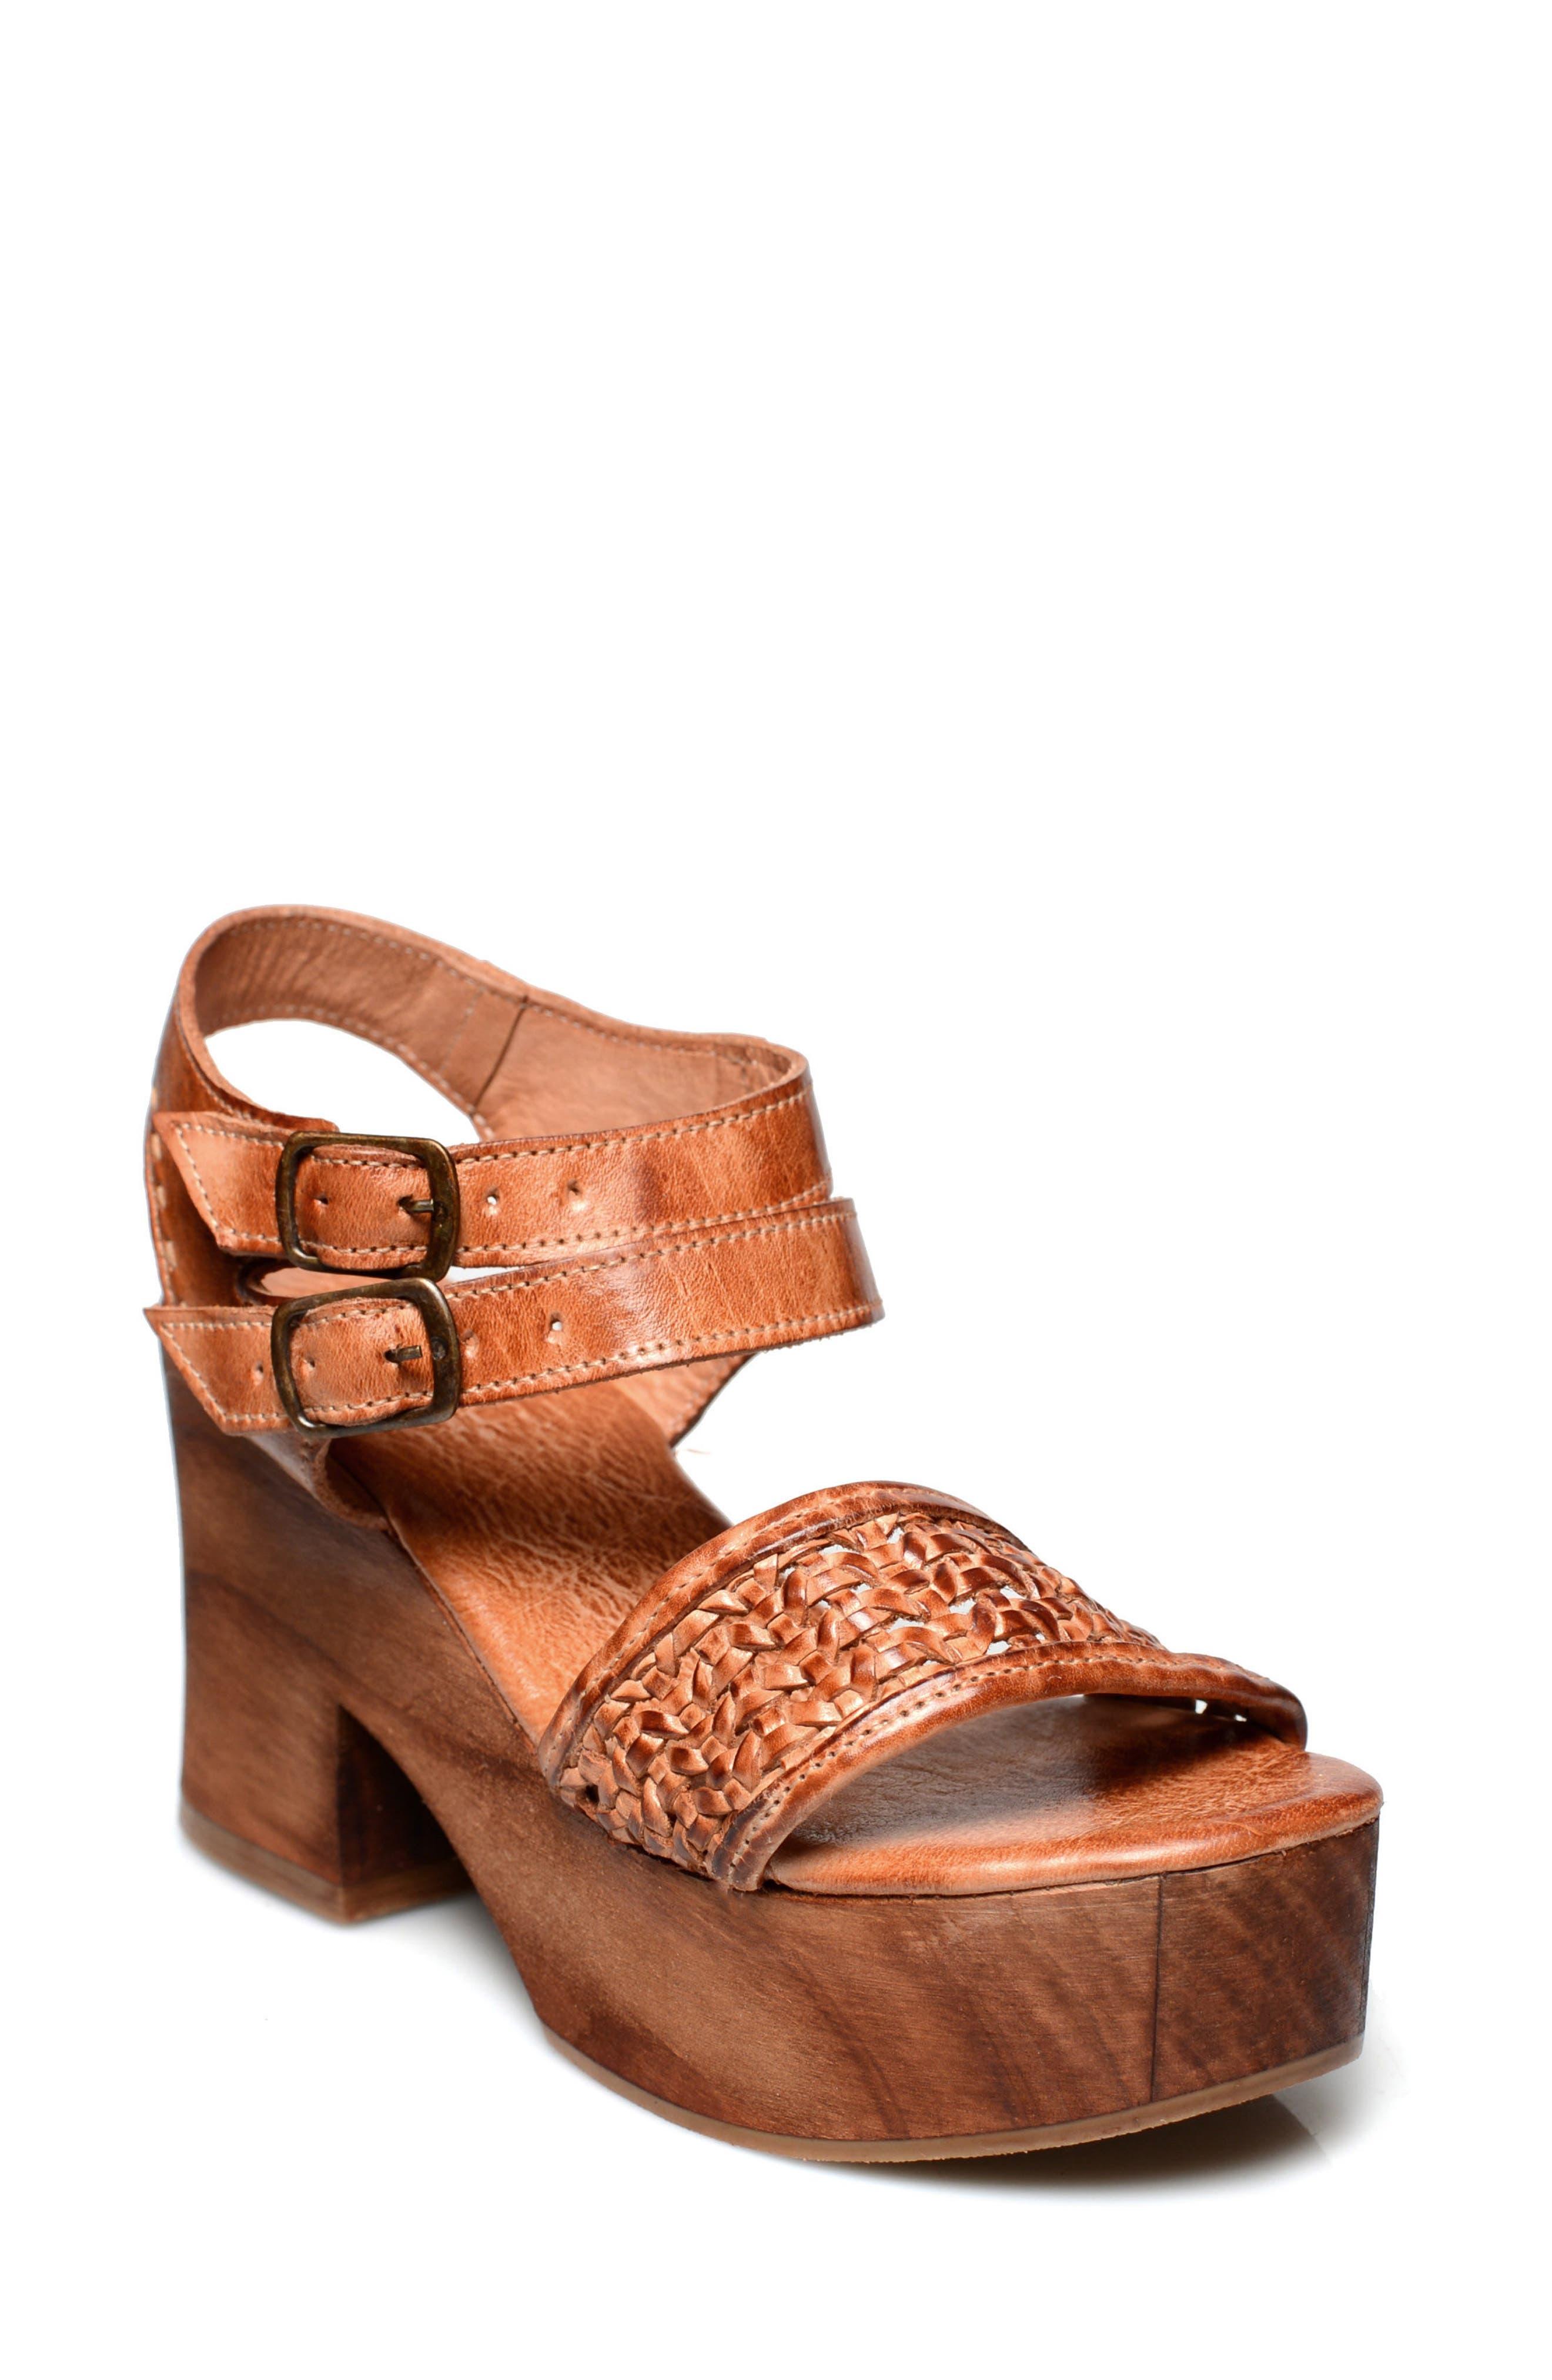 Kenya Platform Sandal,                             Main thumbnail 1, color,                             235